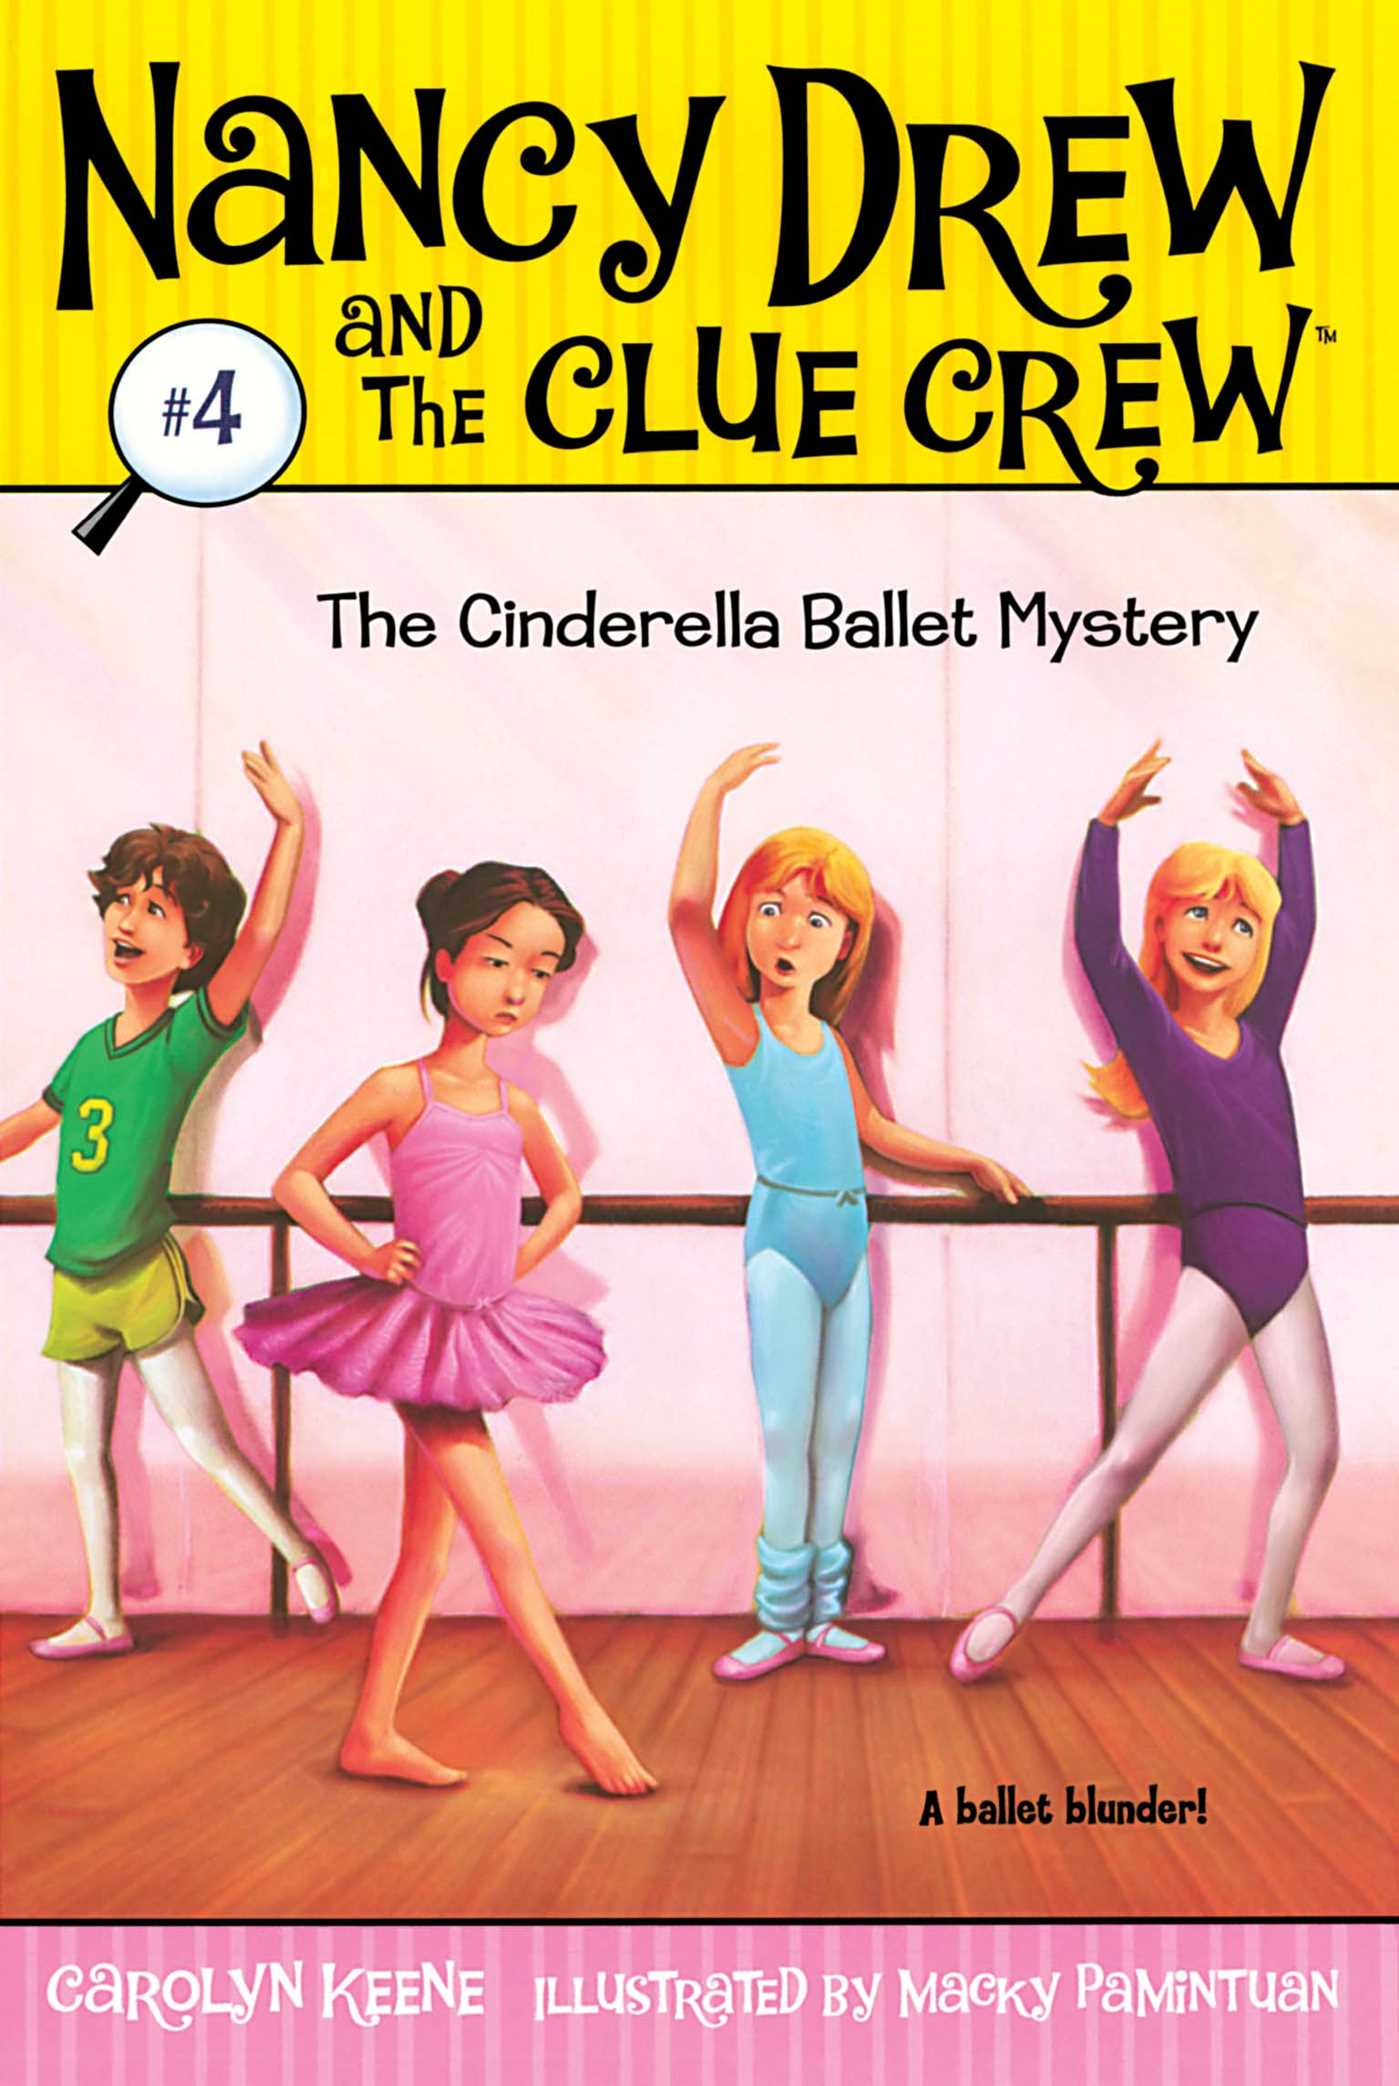 Nancy Drew and the Clue Crew Book Series  |Nancy Drew And The Clue Crew